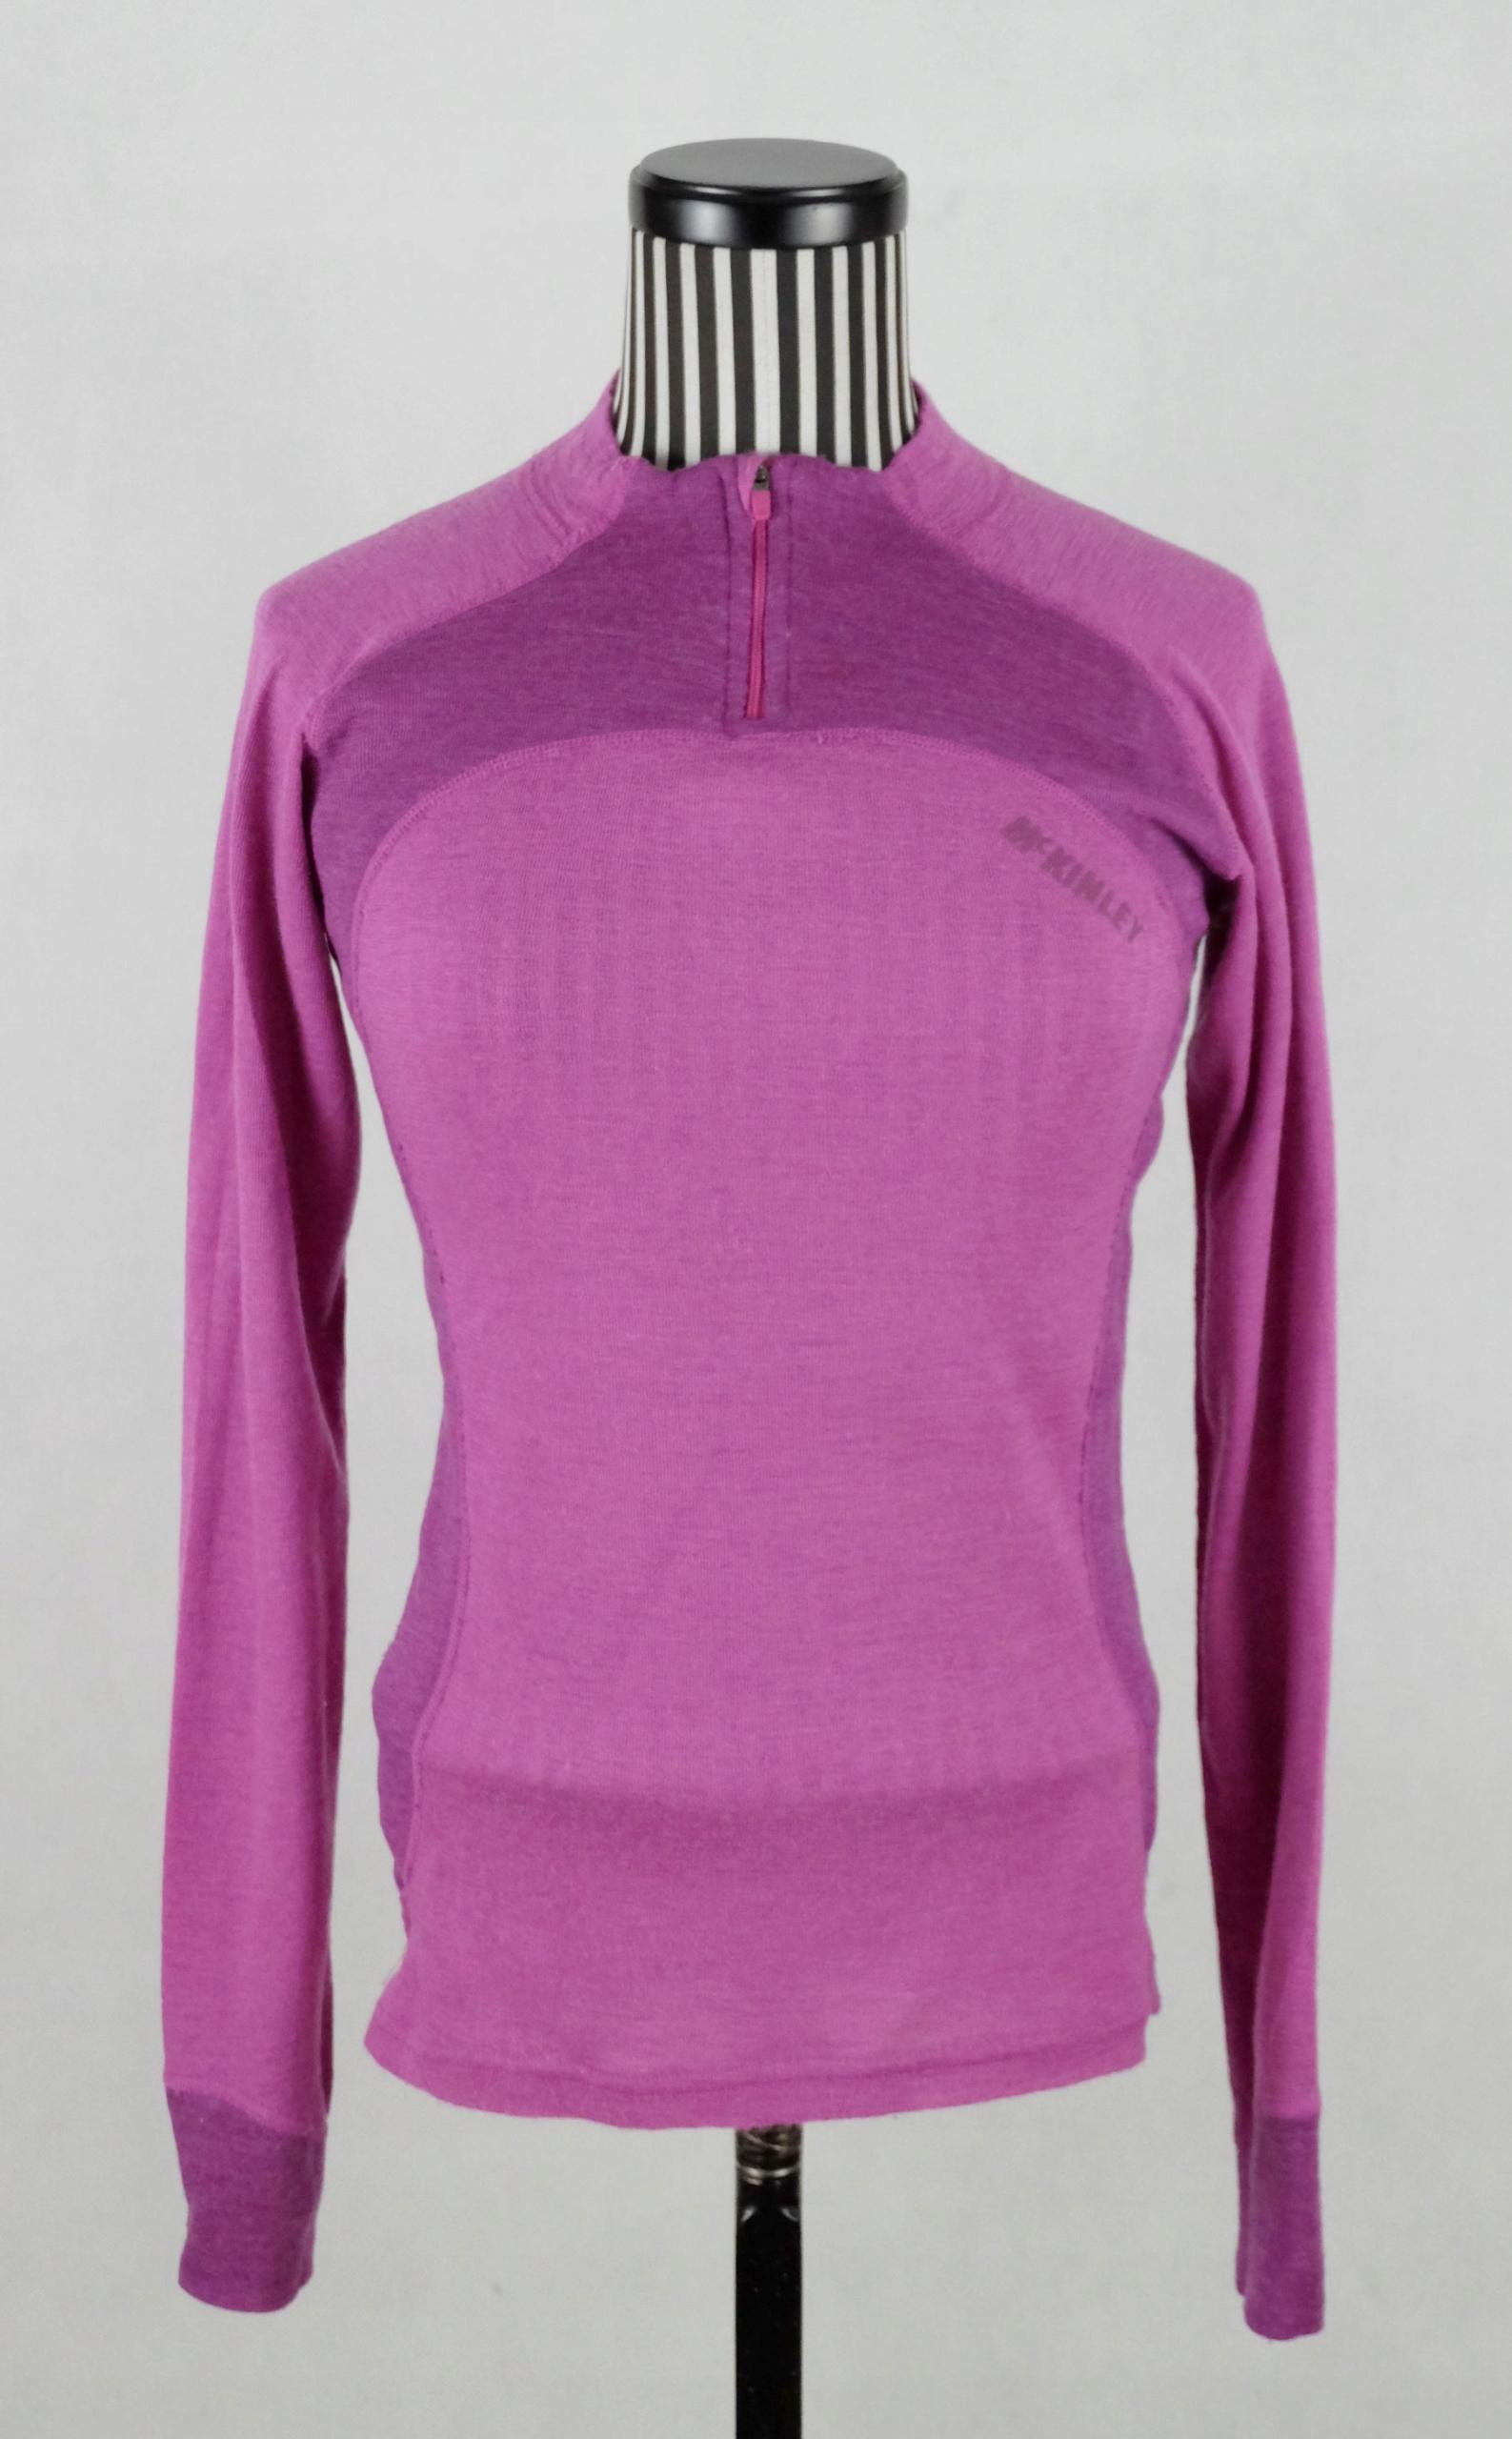 MC KINLEY WOMAN bluzka 100% merino wool S